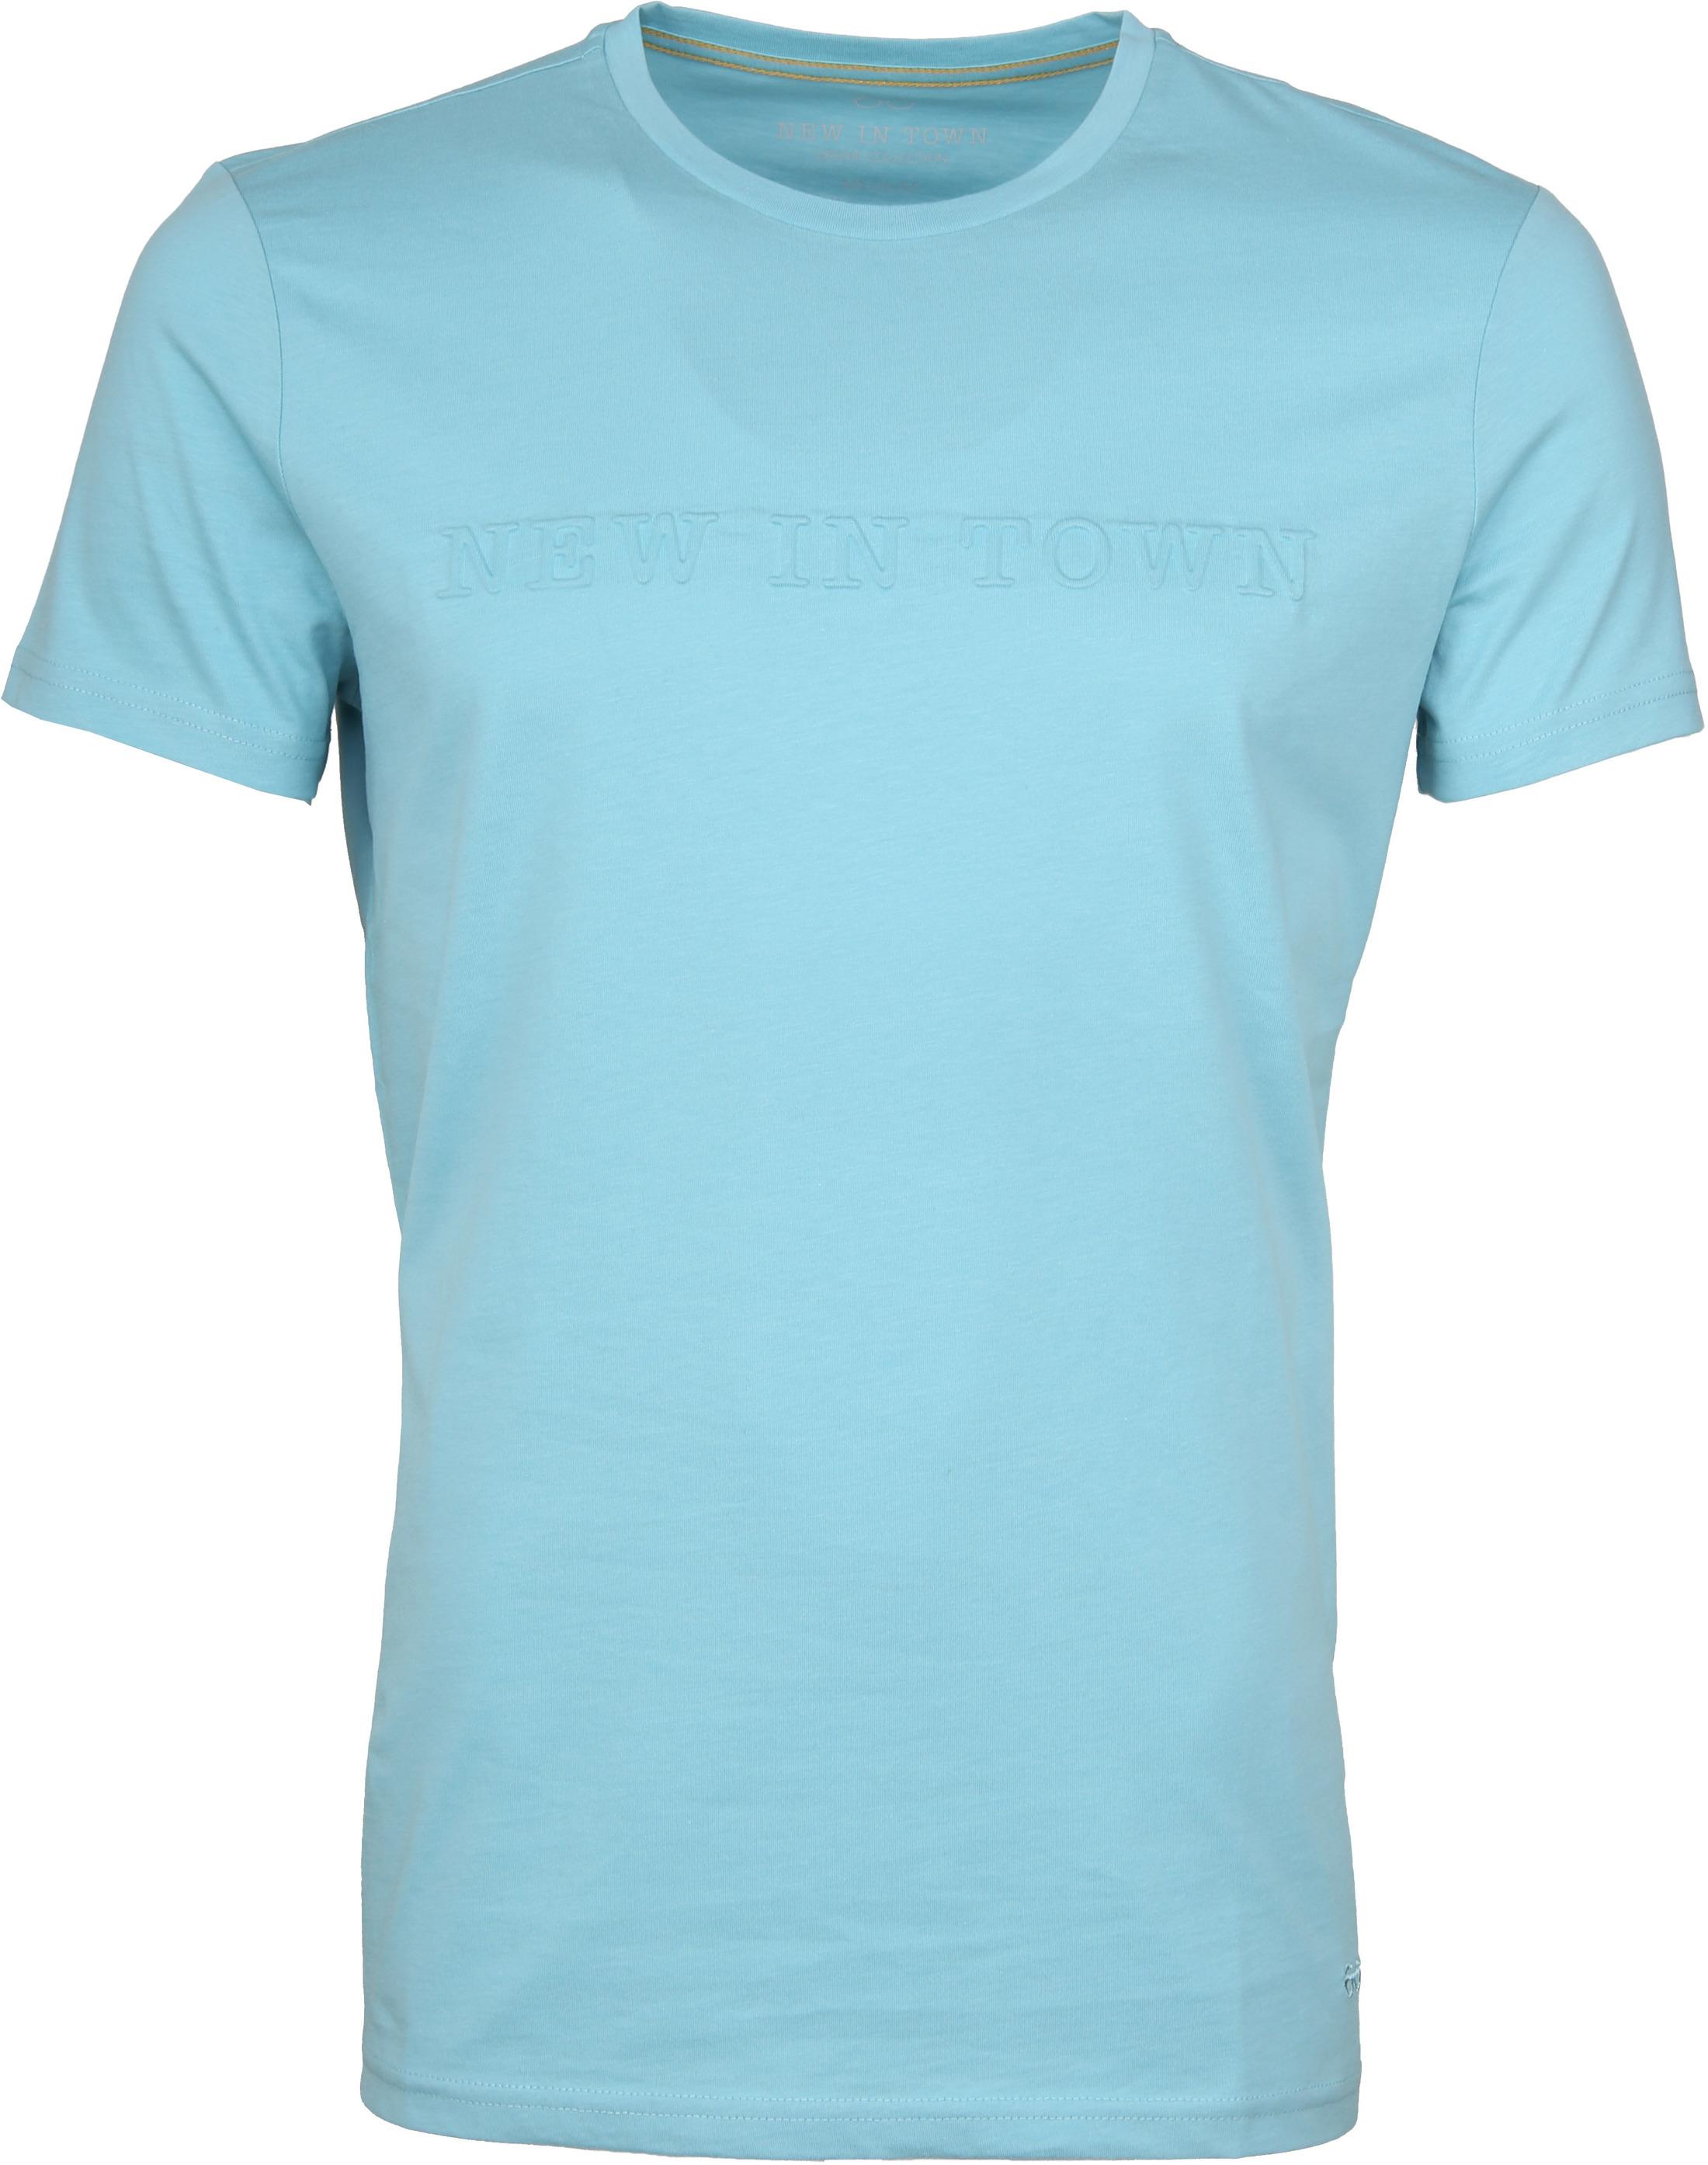 New in Town T-shirt Light Blue foto 0